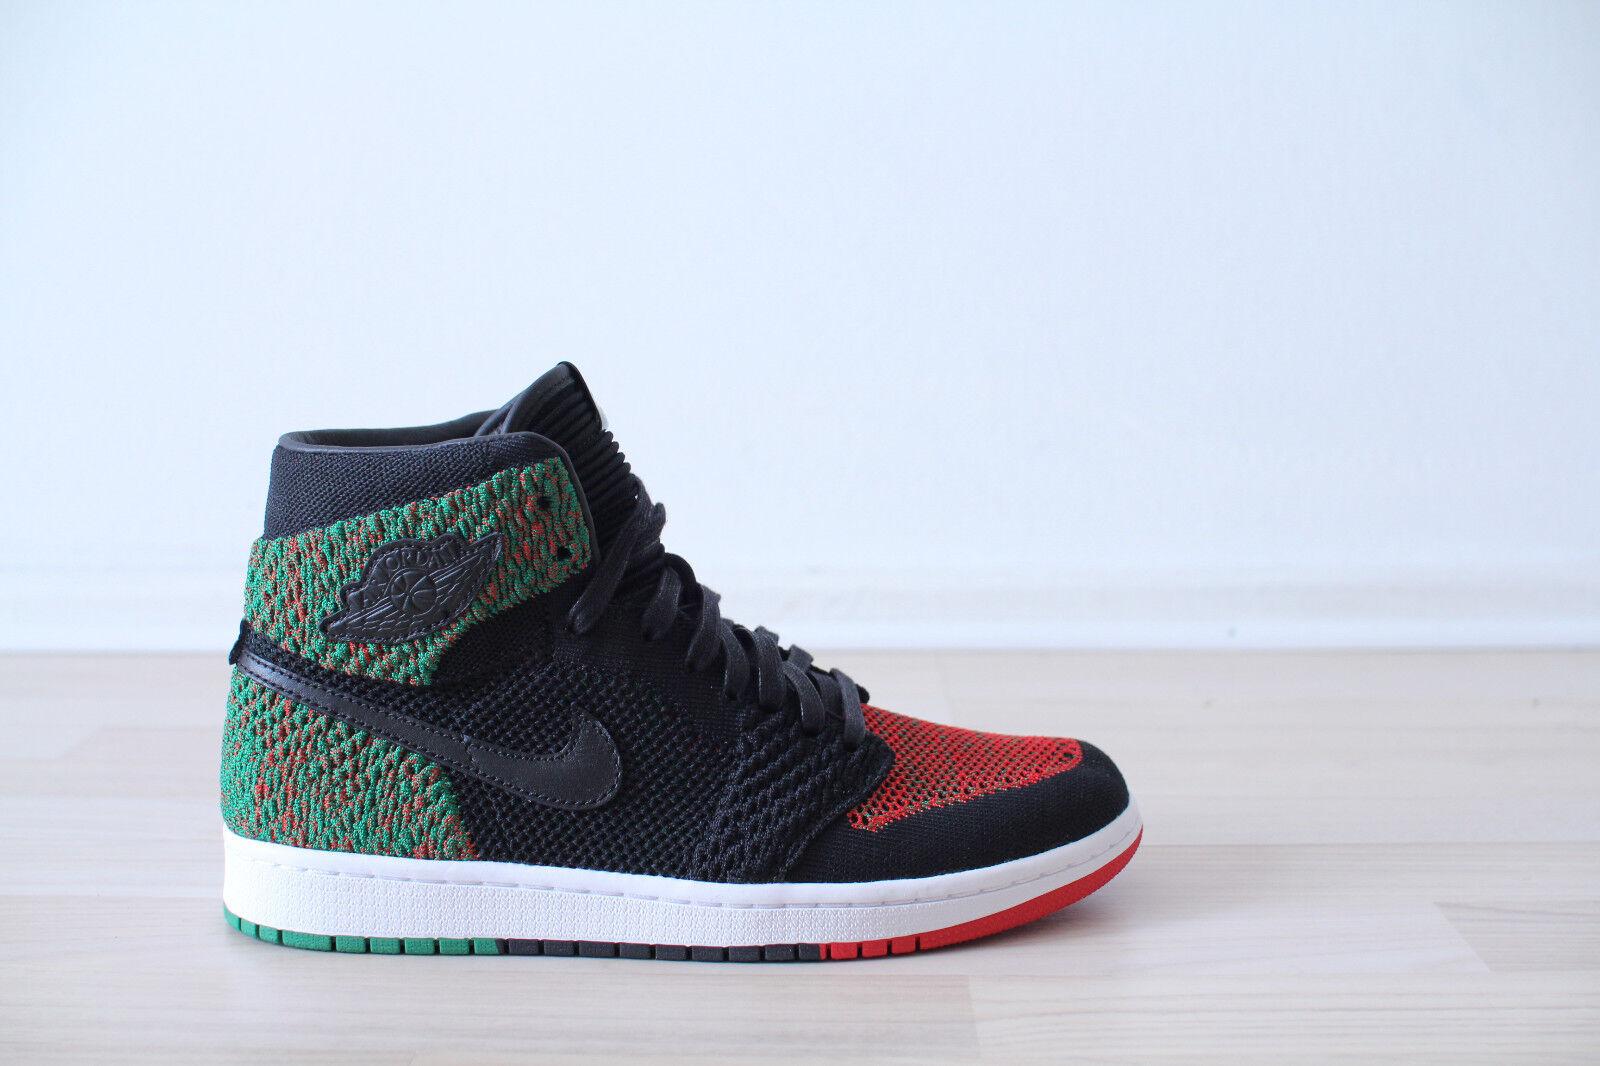 Nike Air Jordan 1 Flyknit BHM black Multicolor Gr. 40,41,44,45,47,48 NEU & OVP